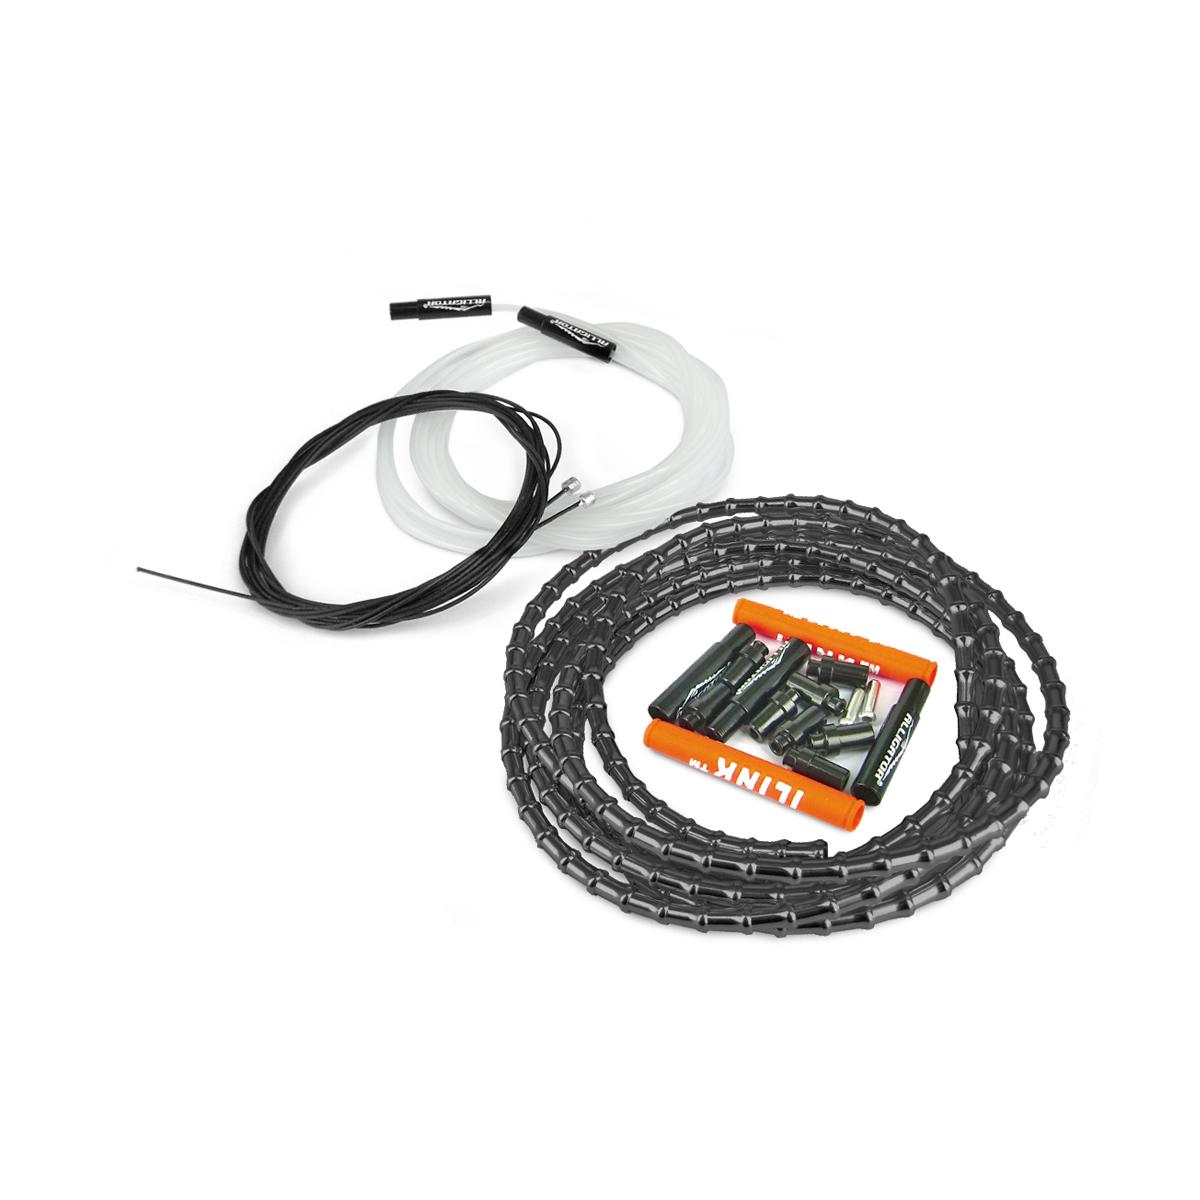 Kit Alligator ILINK dérailleur Noir